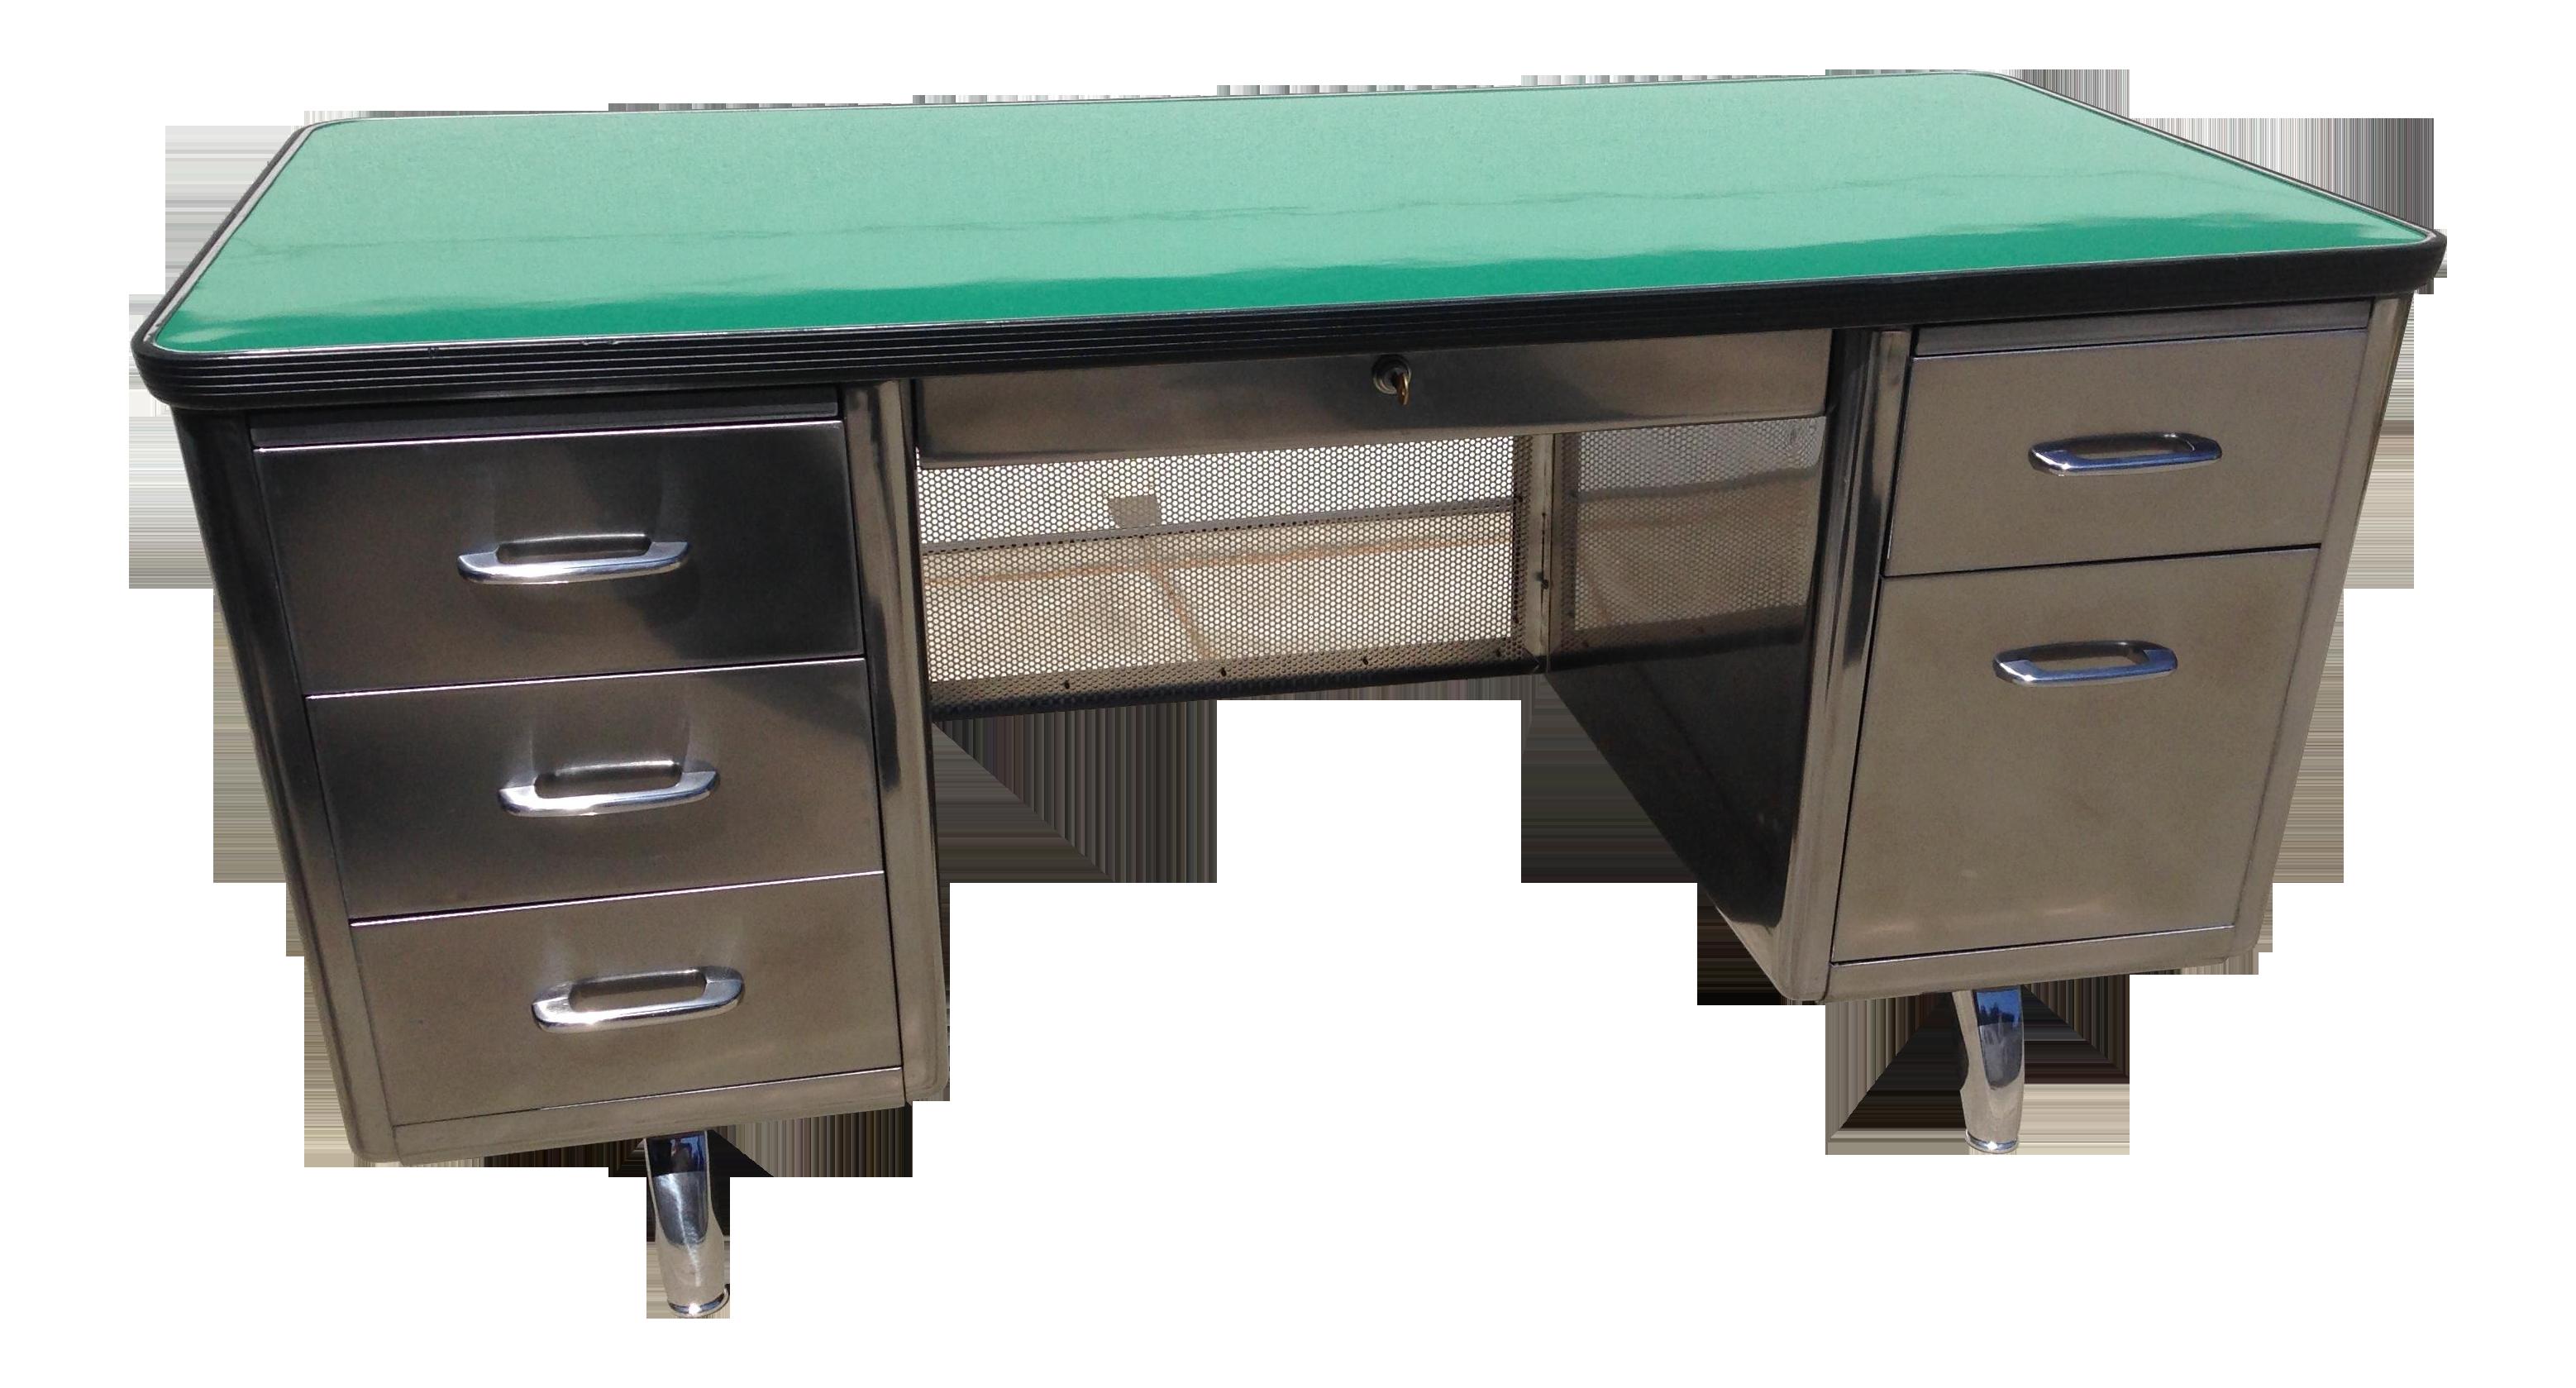 vintage steel furniture. Simple Steel Vintage All Steel Furniture Co Tanker Desk On